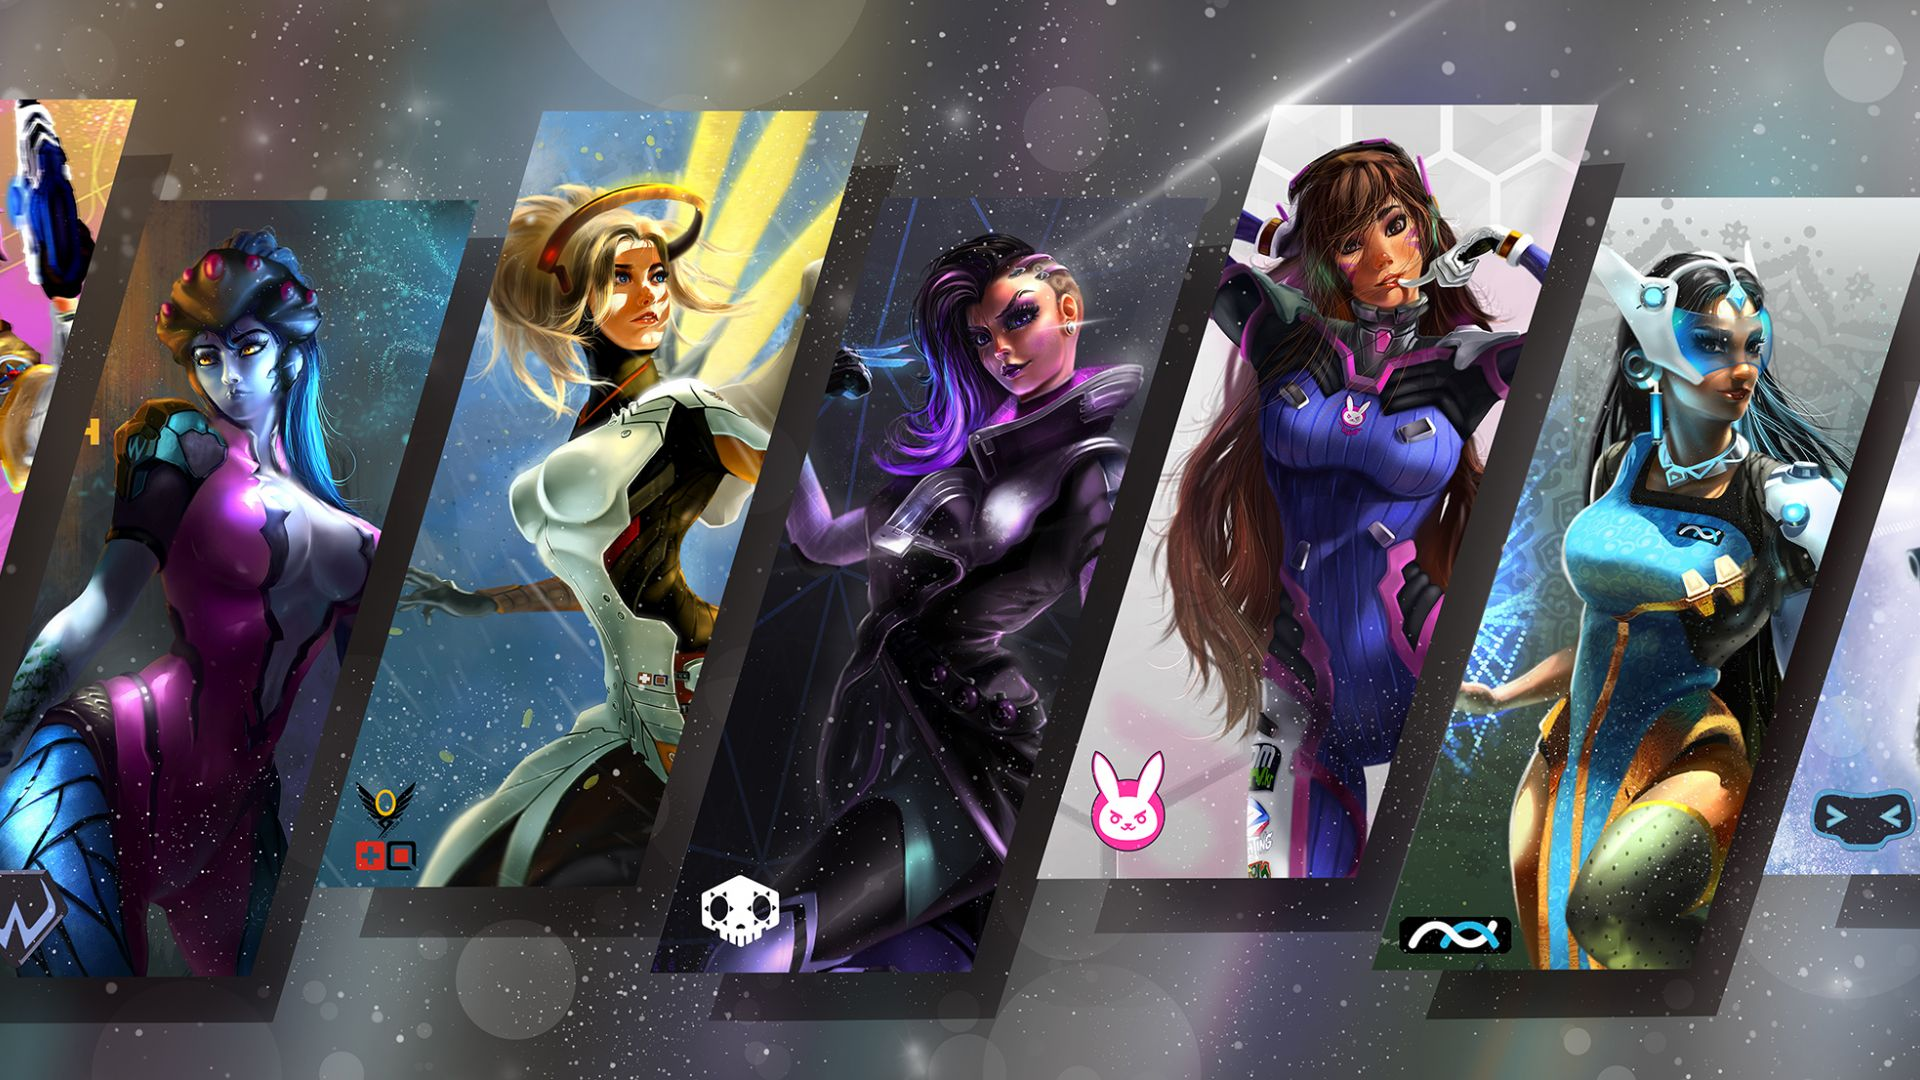 4k Anime Girl Wallpaper For Phones Desktop Wallpaper Overwatch Video Game Girls Hd Image